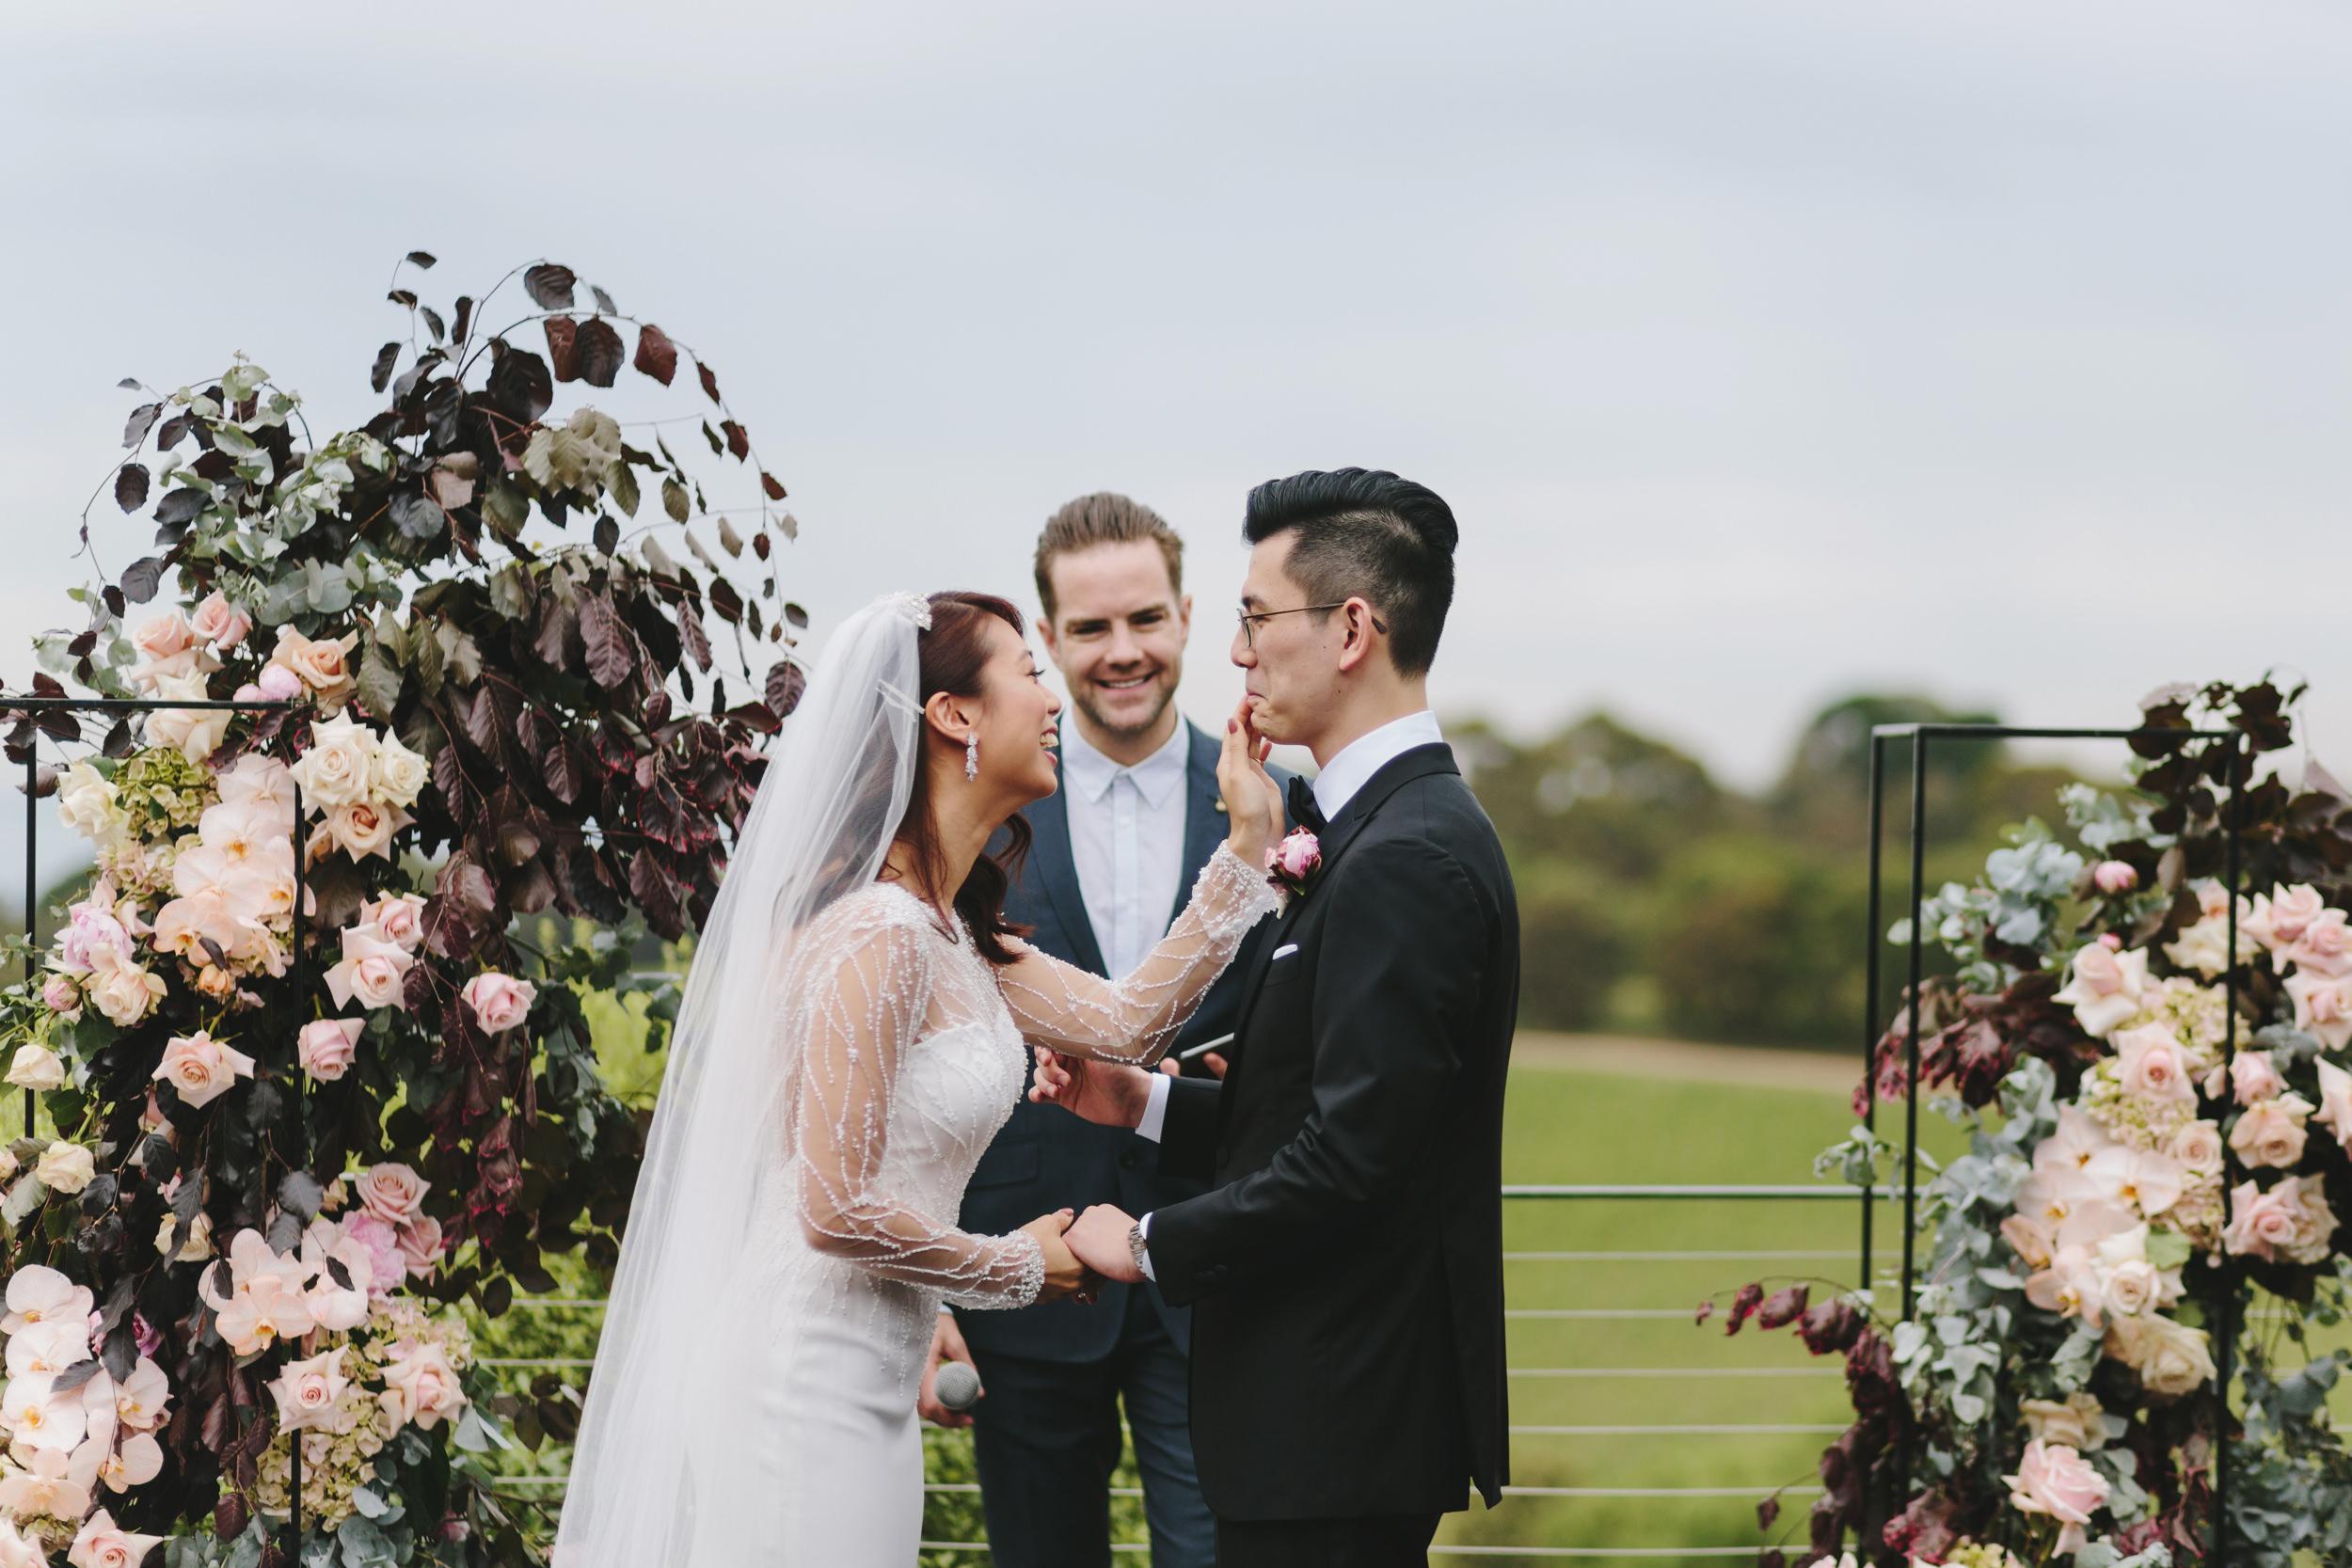 Melbourne Winery Wedding Daryl & Adeline 49.JPG